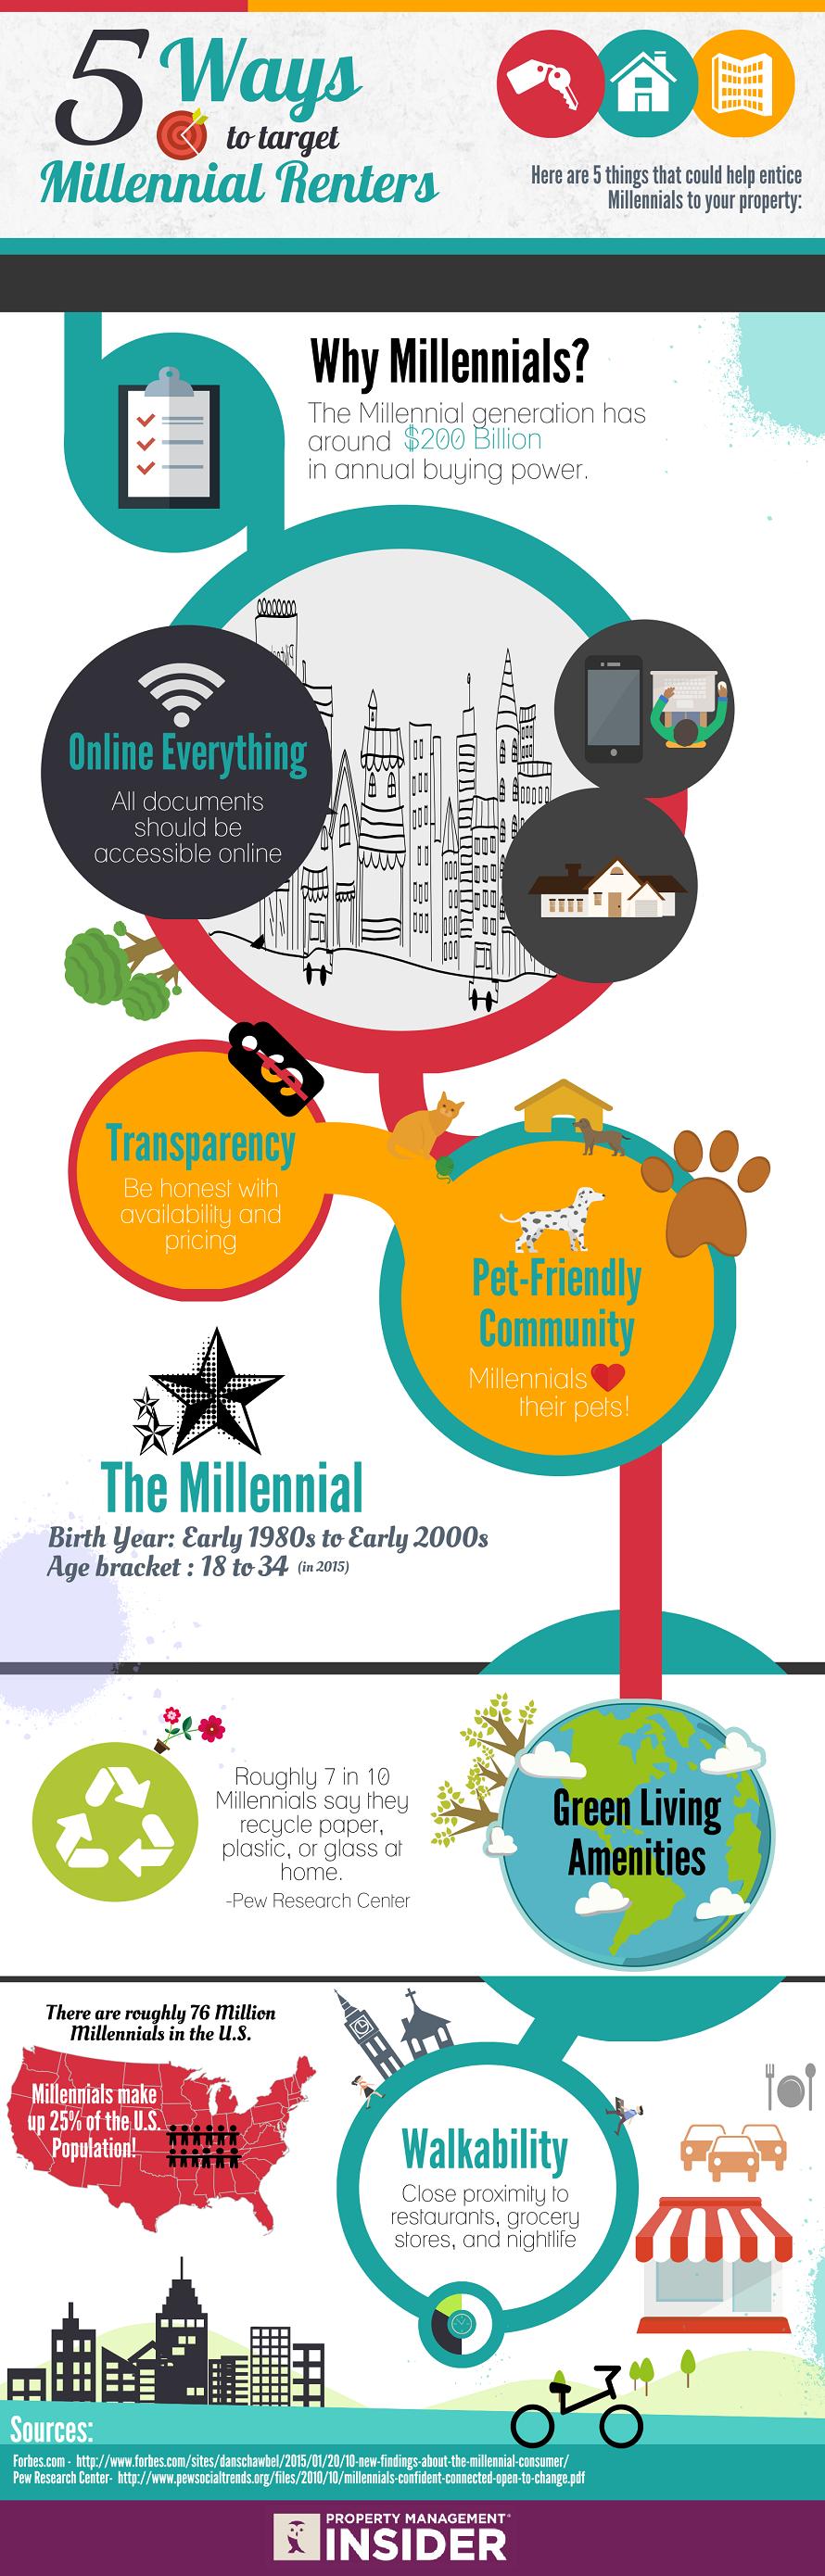 Millennial Renter Must Haves | National DoorStep | 844-APT-TRASH